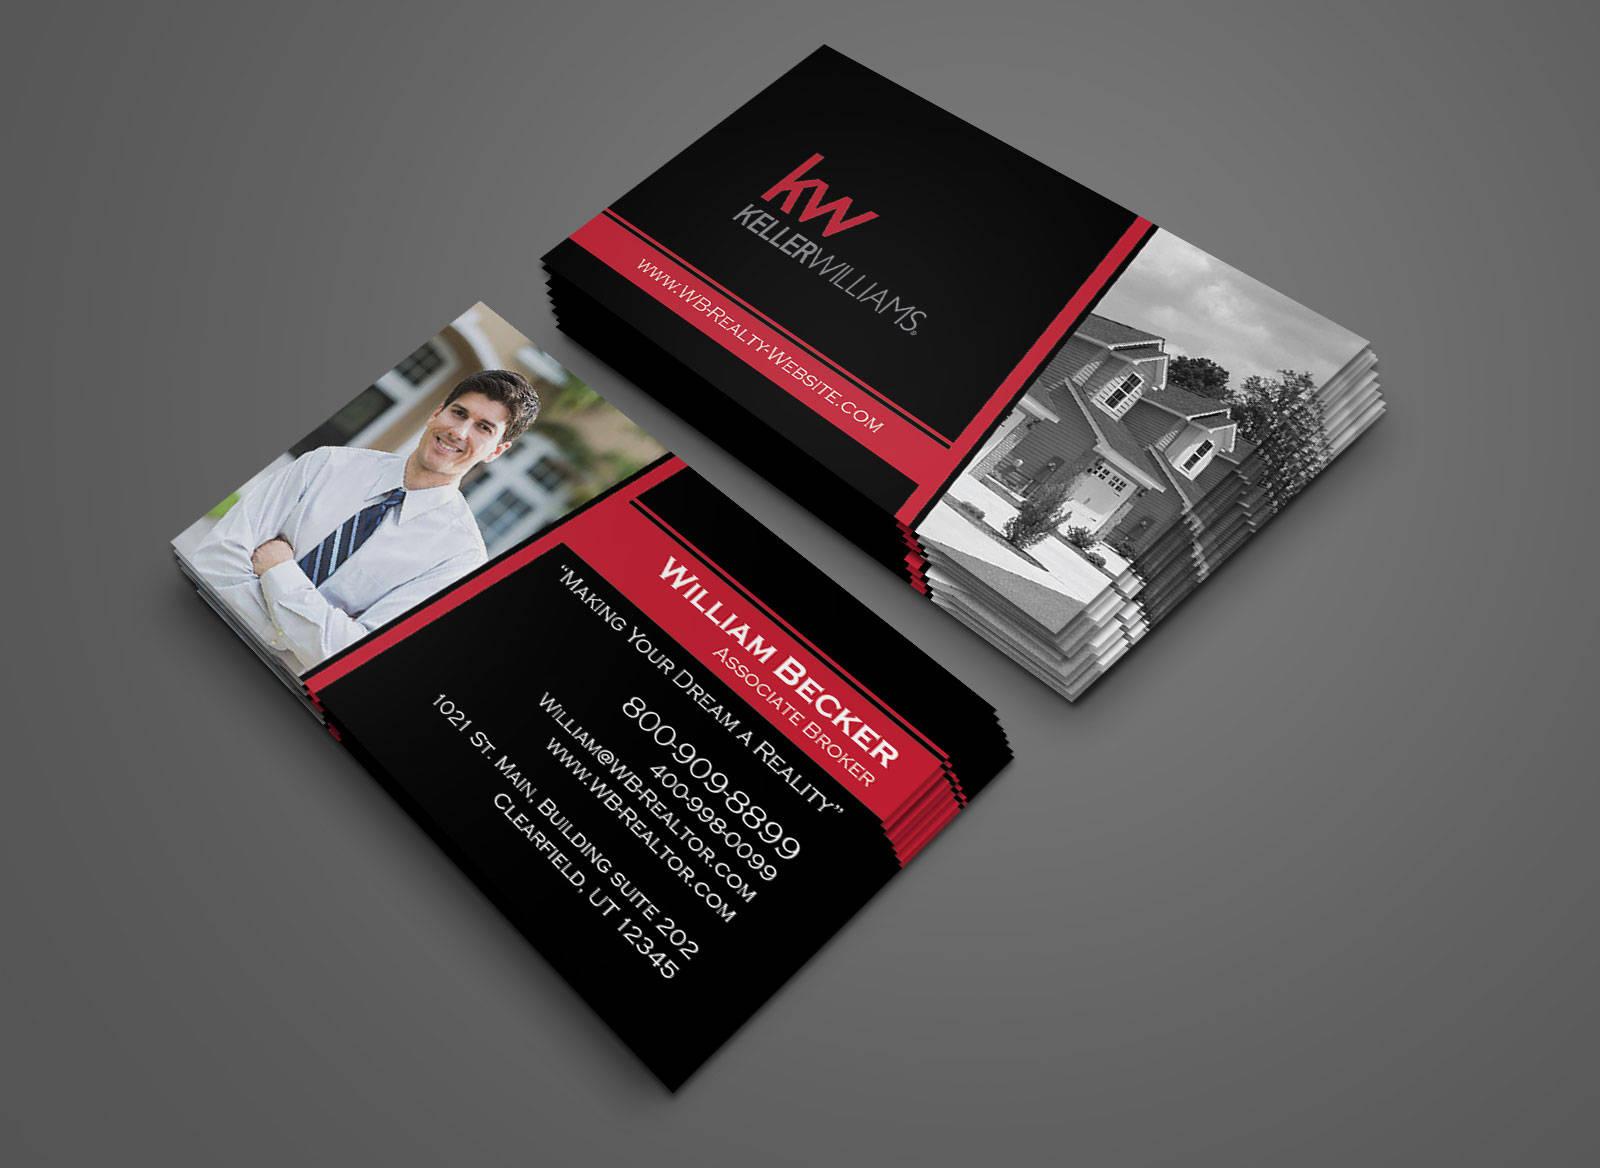 Keller Williams Business Card Design - Century21 - Coldwell Banker - Real  Estate - Custom Design For Coldwell Banker Business Card Template